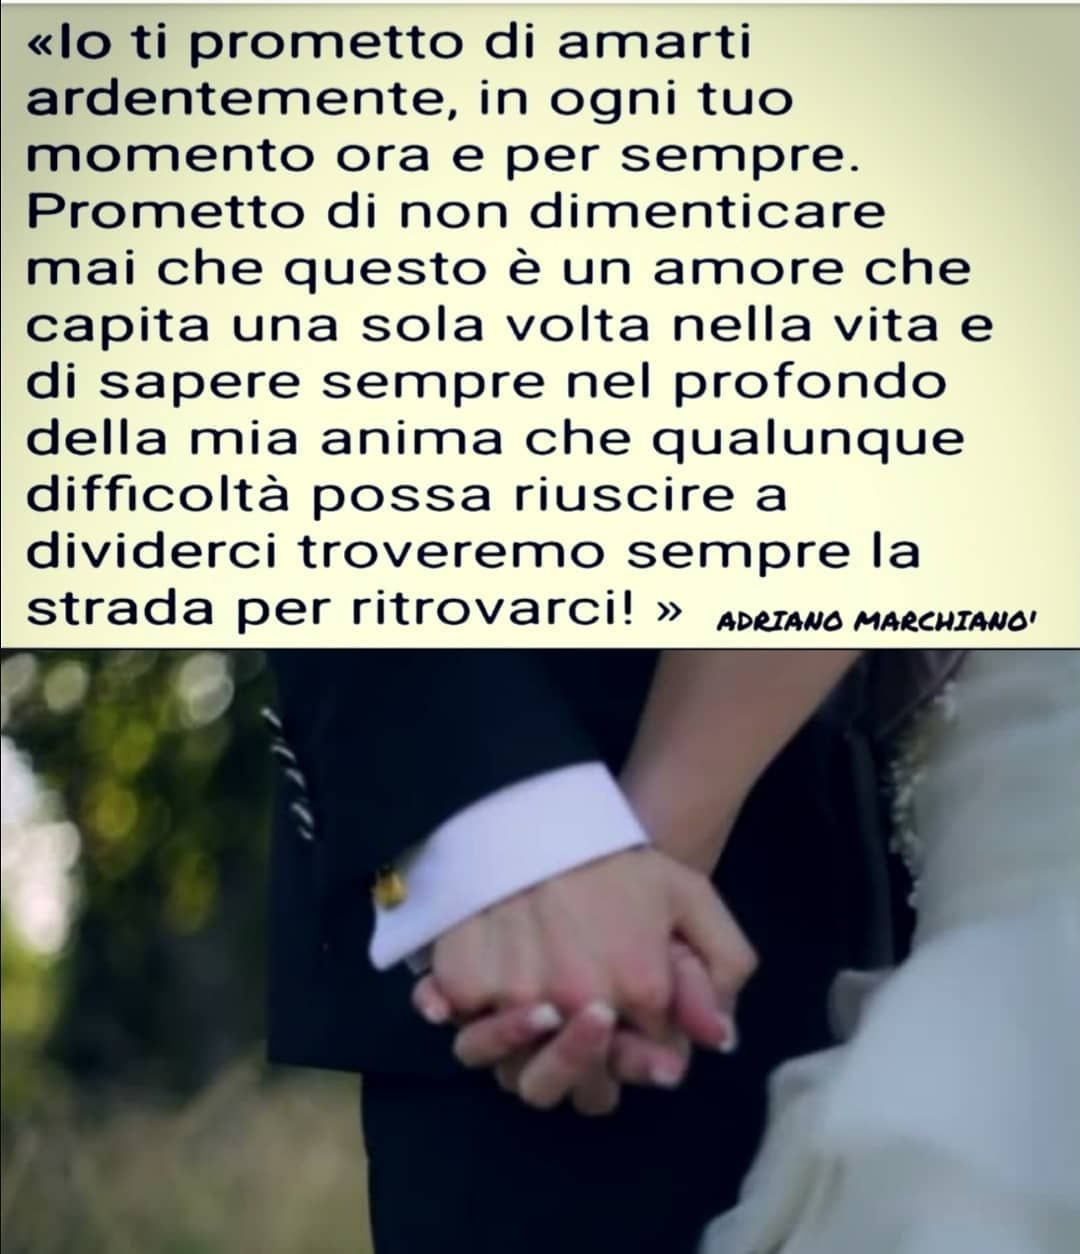 Promessa D Amore Promessadamore Promessa Teloprometto Amoreraro Amoreunico Amoreinfinito Amoreimmenso G Amore Frasi D Amore Poesie D Amore